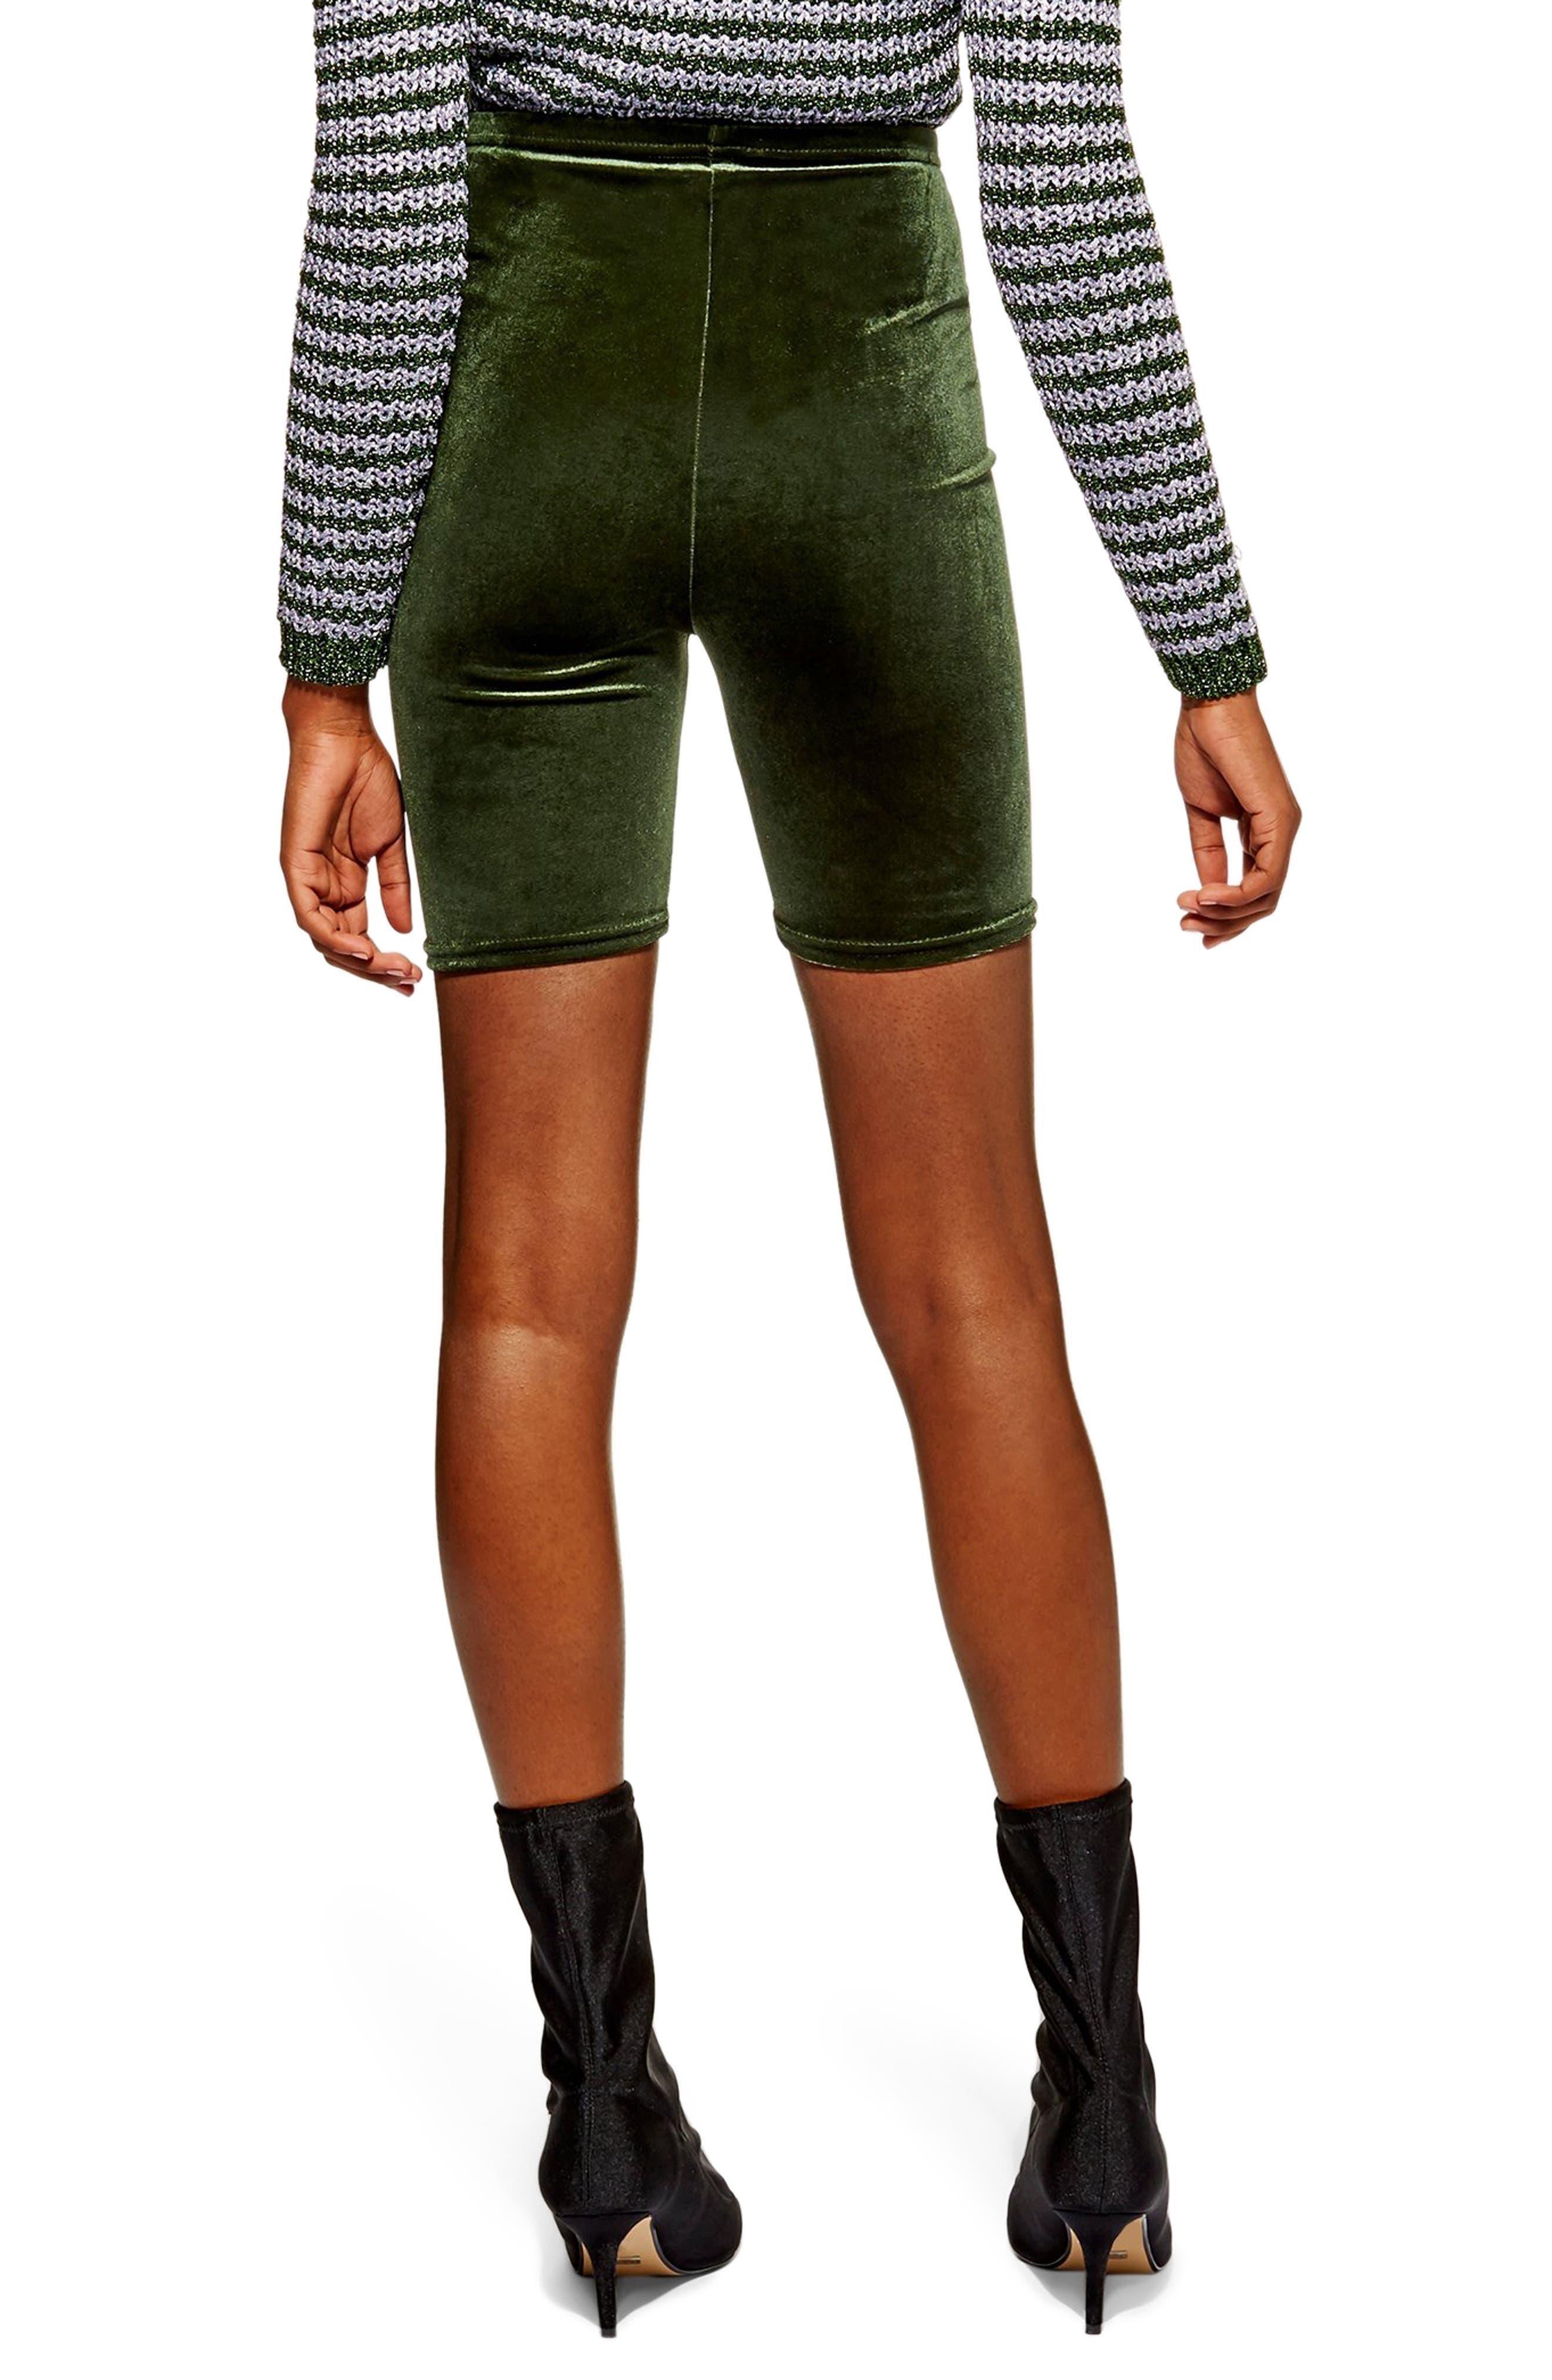 Velvet Cycling Shorts,                             Alternate thumbnail 2, color,                             OLIVE